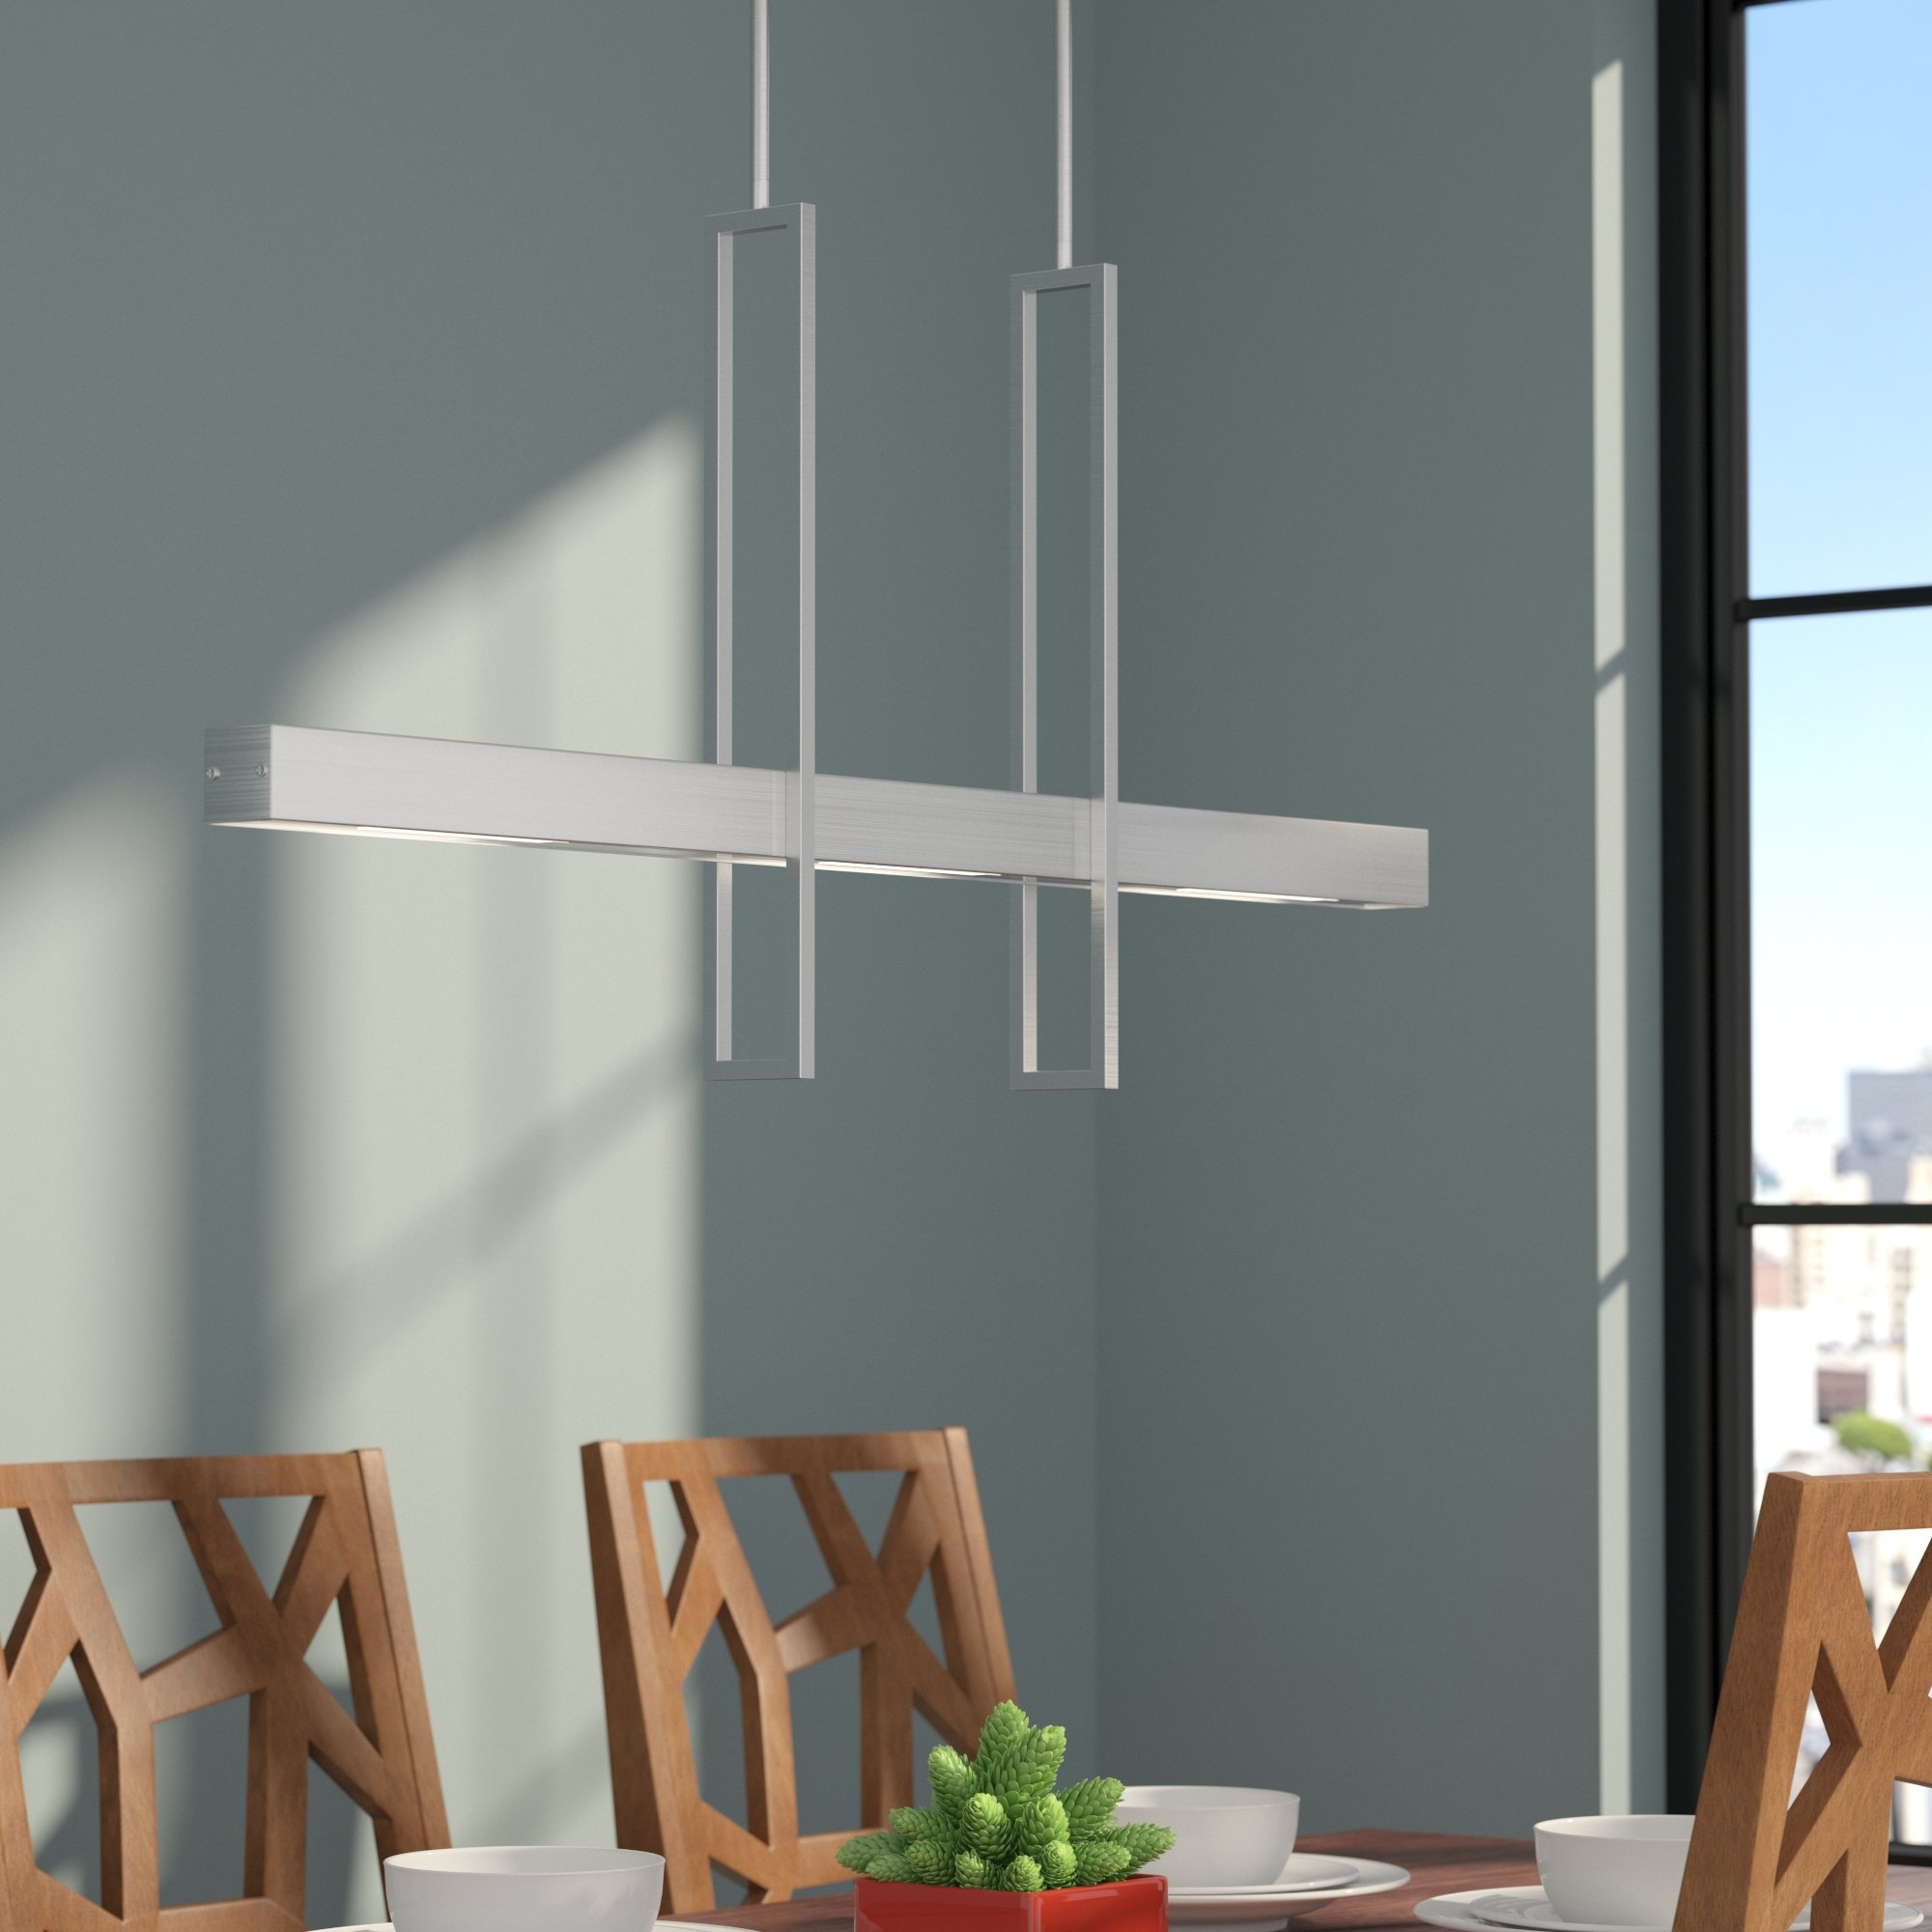 Callington 1 Light Led Single Geometric Pendants With Regard To 2020 Callington 2 Light Led Kitchen Island Linear Pendant (Gallery 5 of 20)